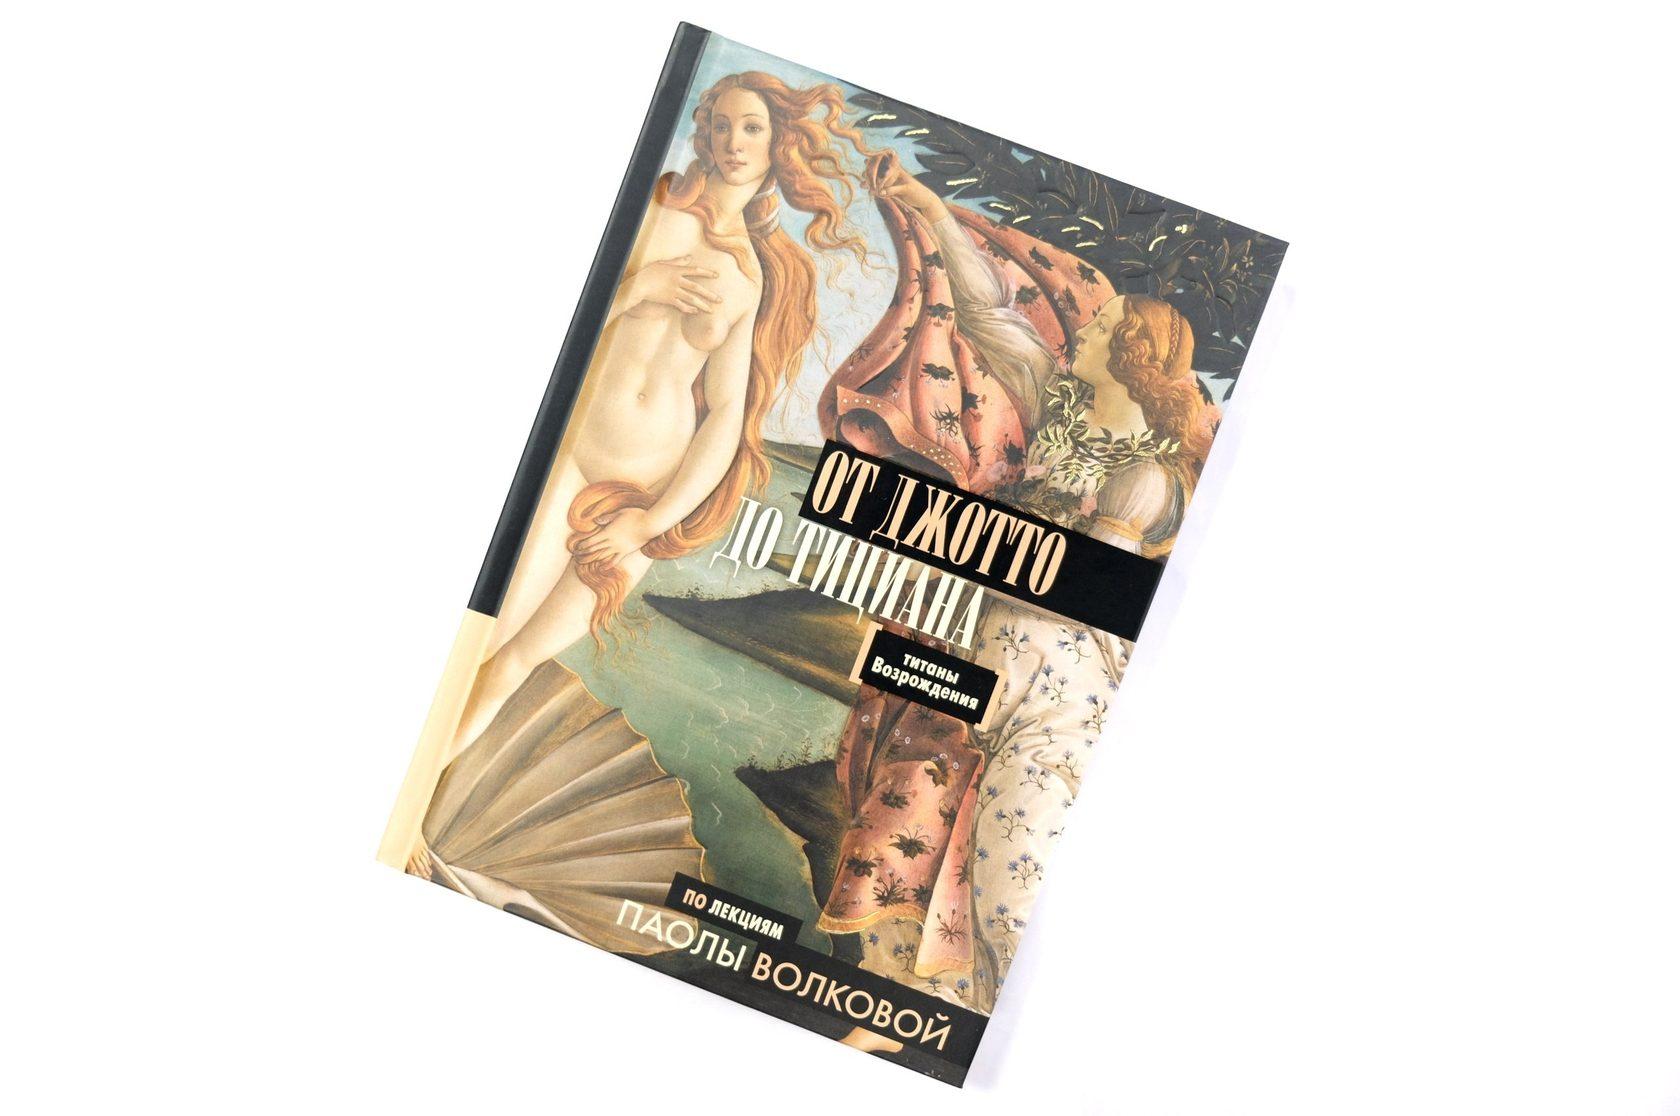 Паола Волкова «От Джотто до Тициана — Титаны Возрождения»